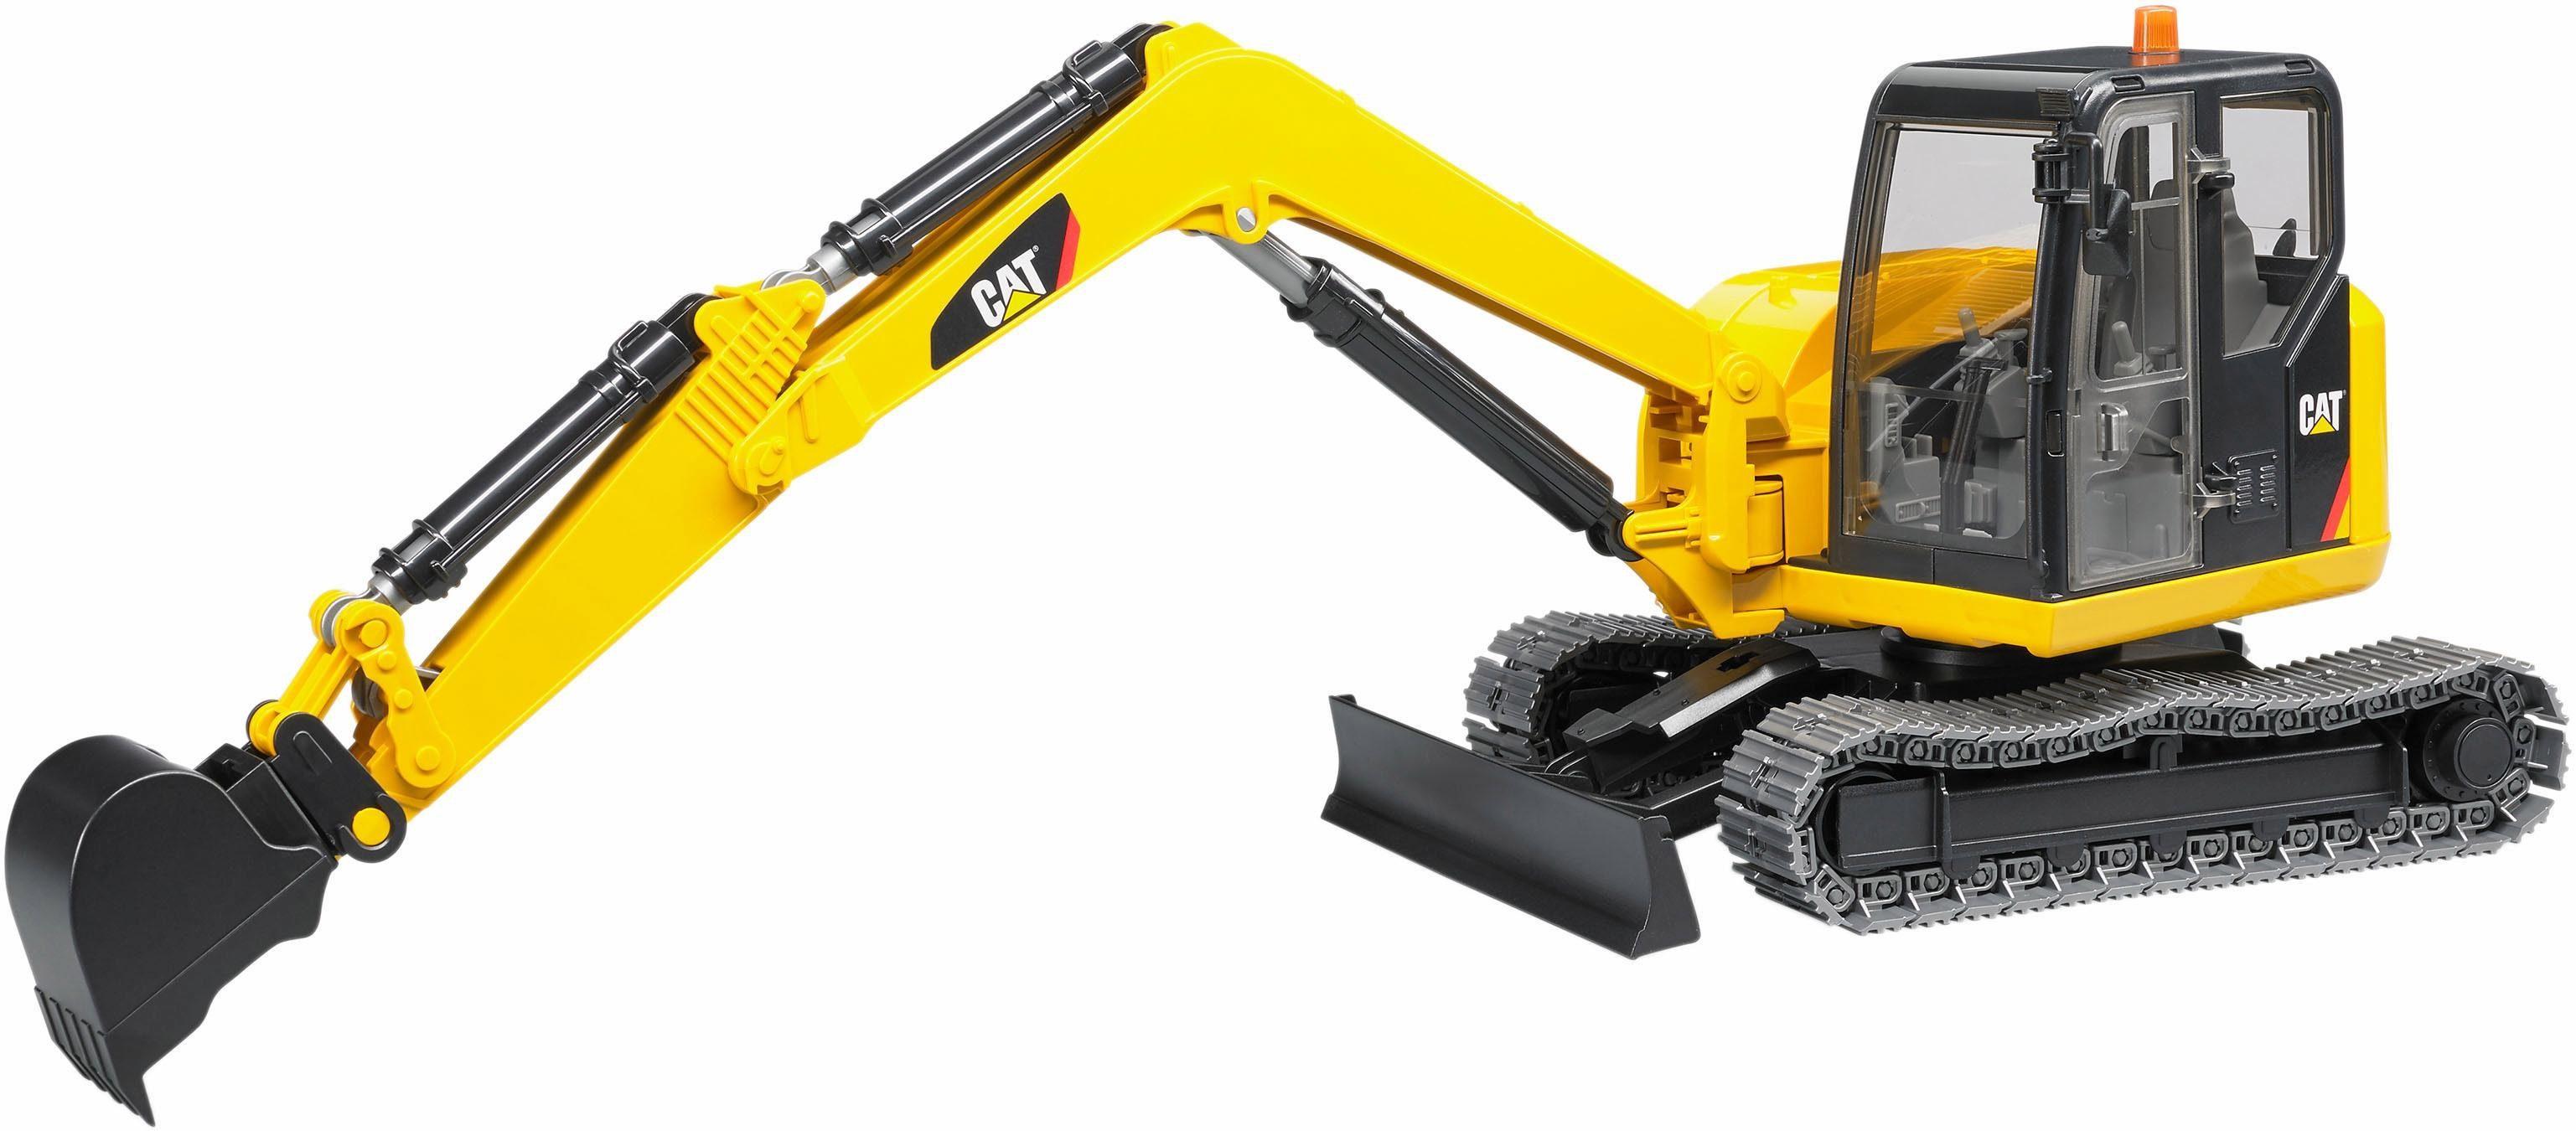 bruder® Spielzeug Bagger 2456, »CAT Minibagger, 1:16, gelb«